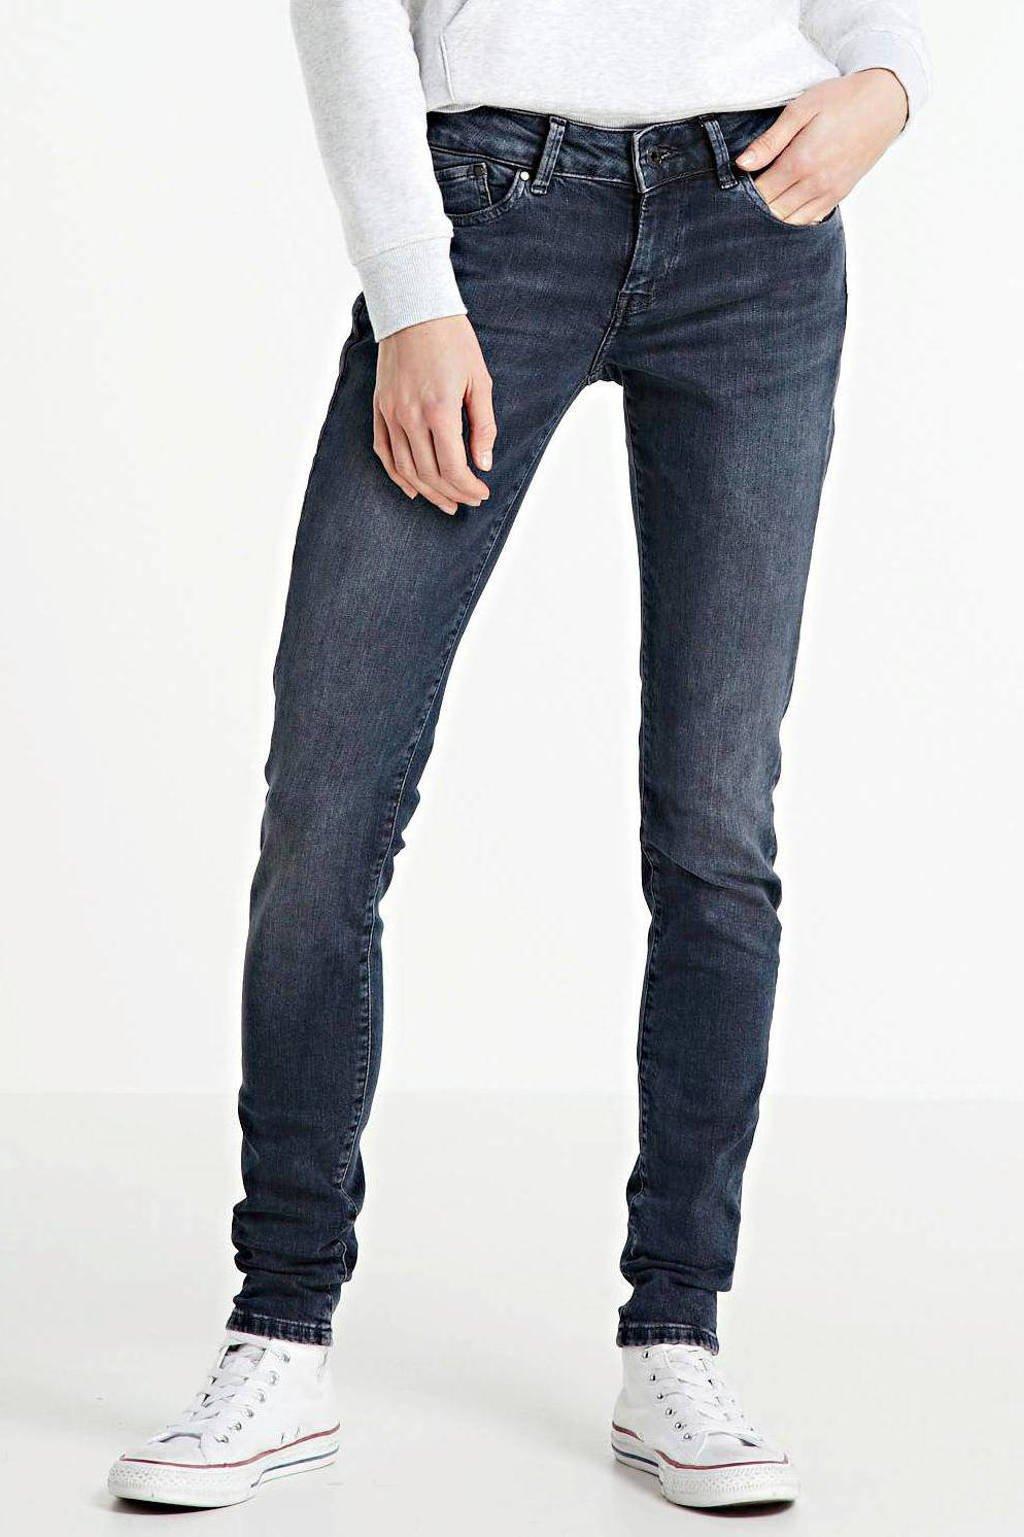 Pepe Jeans Pixie skinny fit jeans 000DENIM